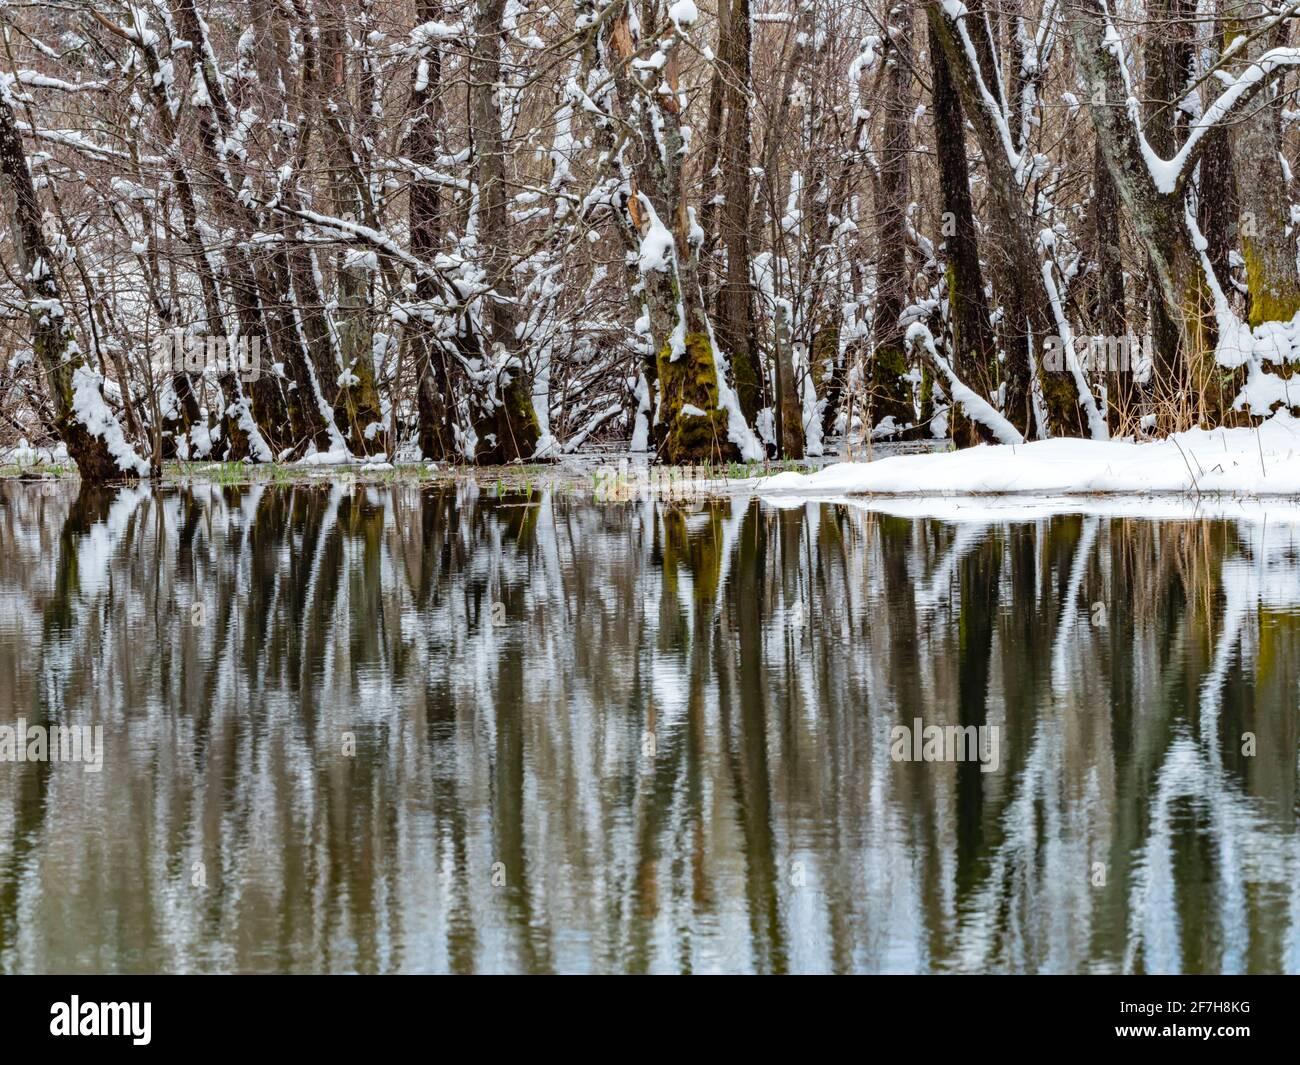 Trees lined along lake Bajer town Fuzine in Croatia Europe Stock Photo